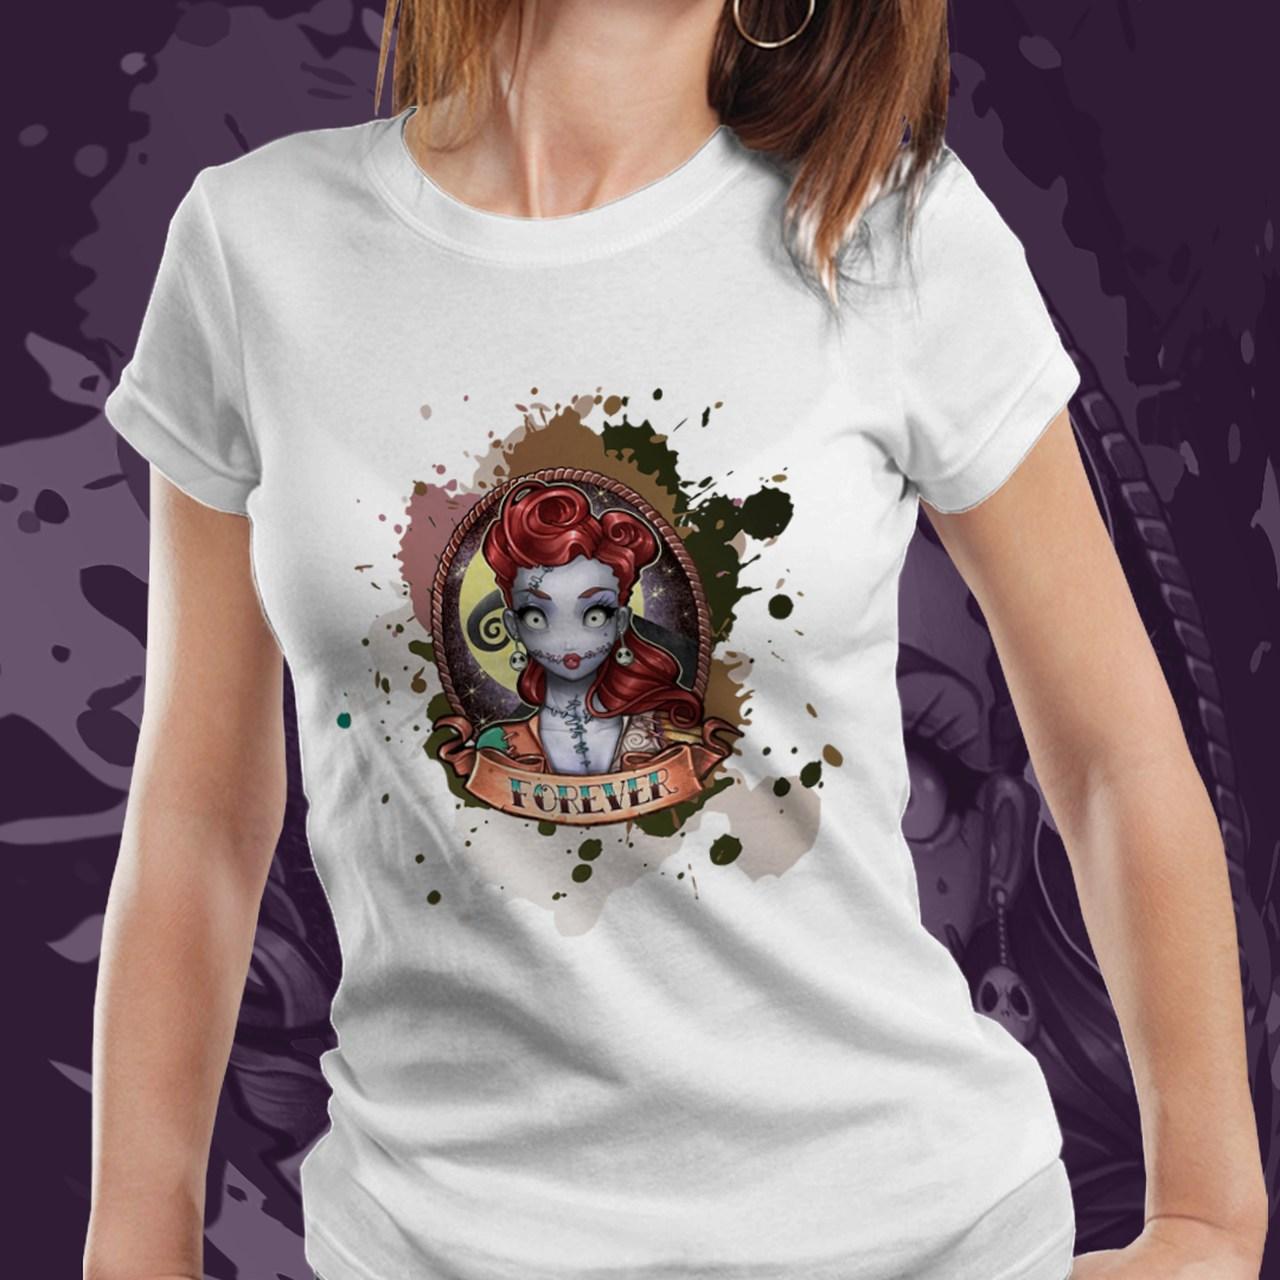 Camiseta Feminina Sally: O Estranho Mundo de Jack - (Branco) - EV